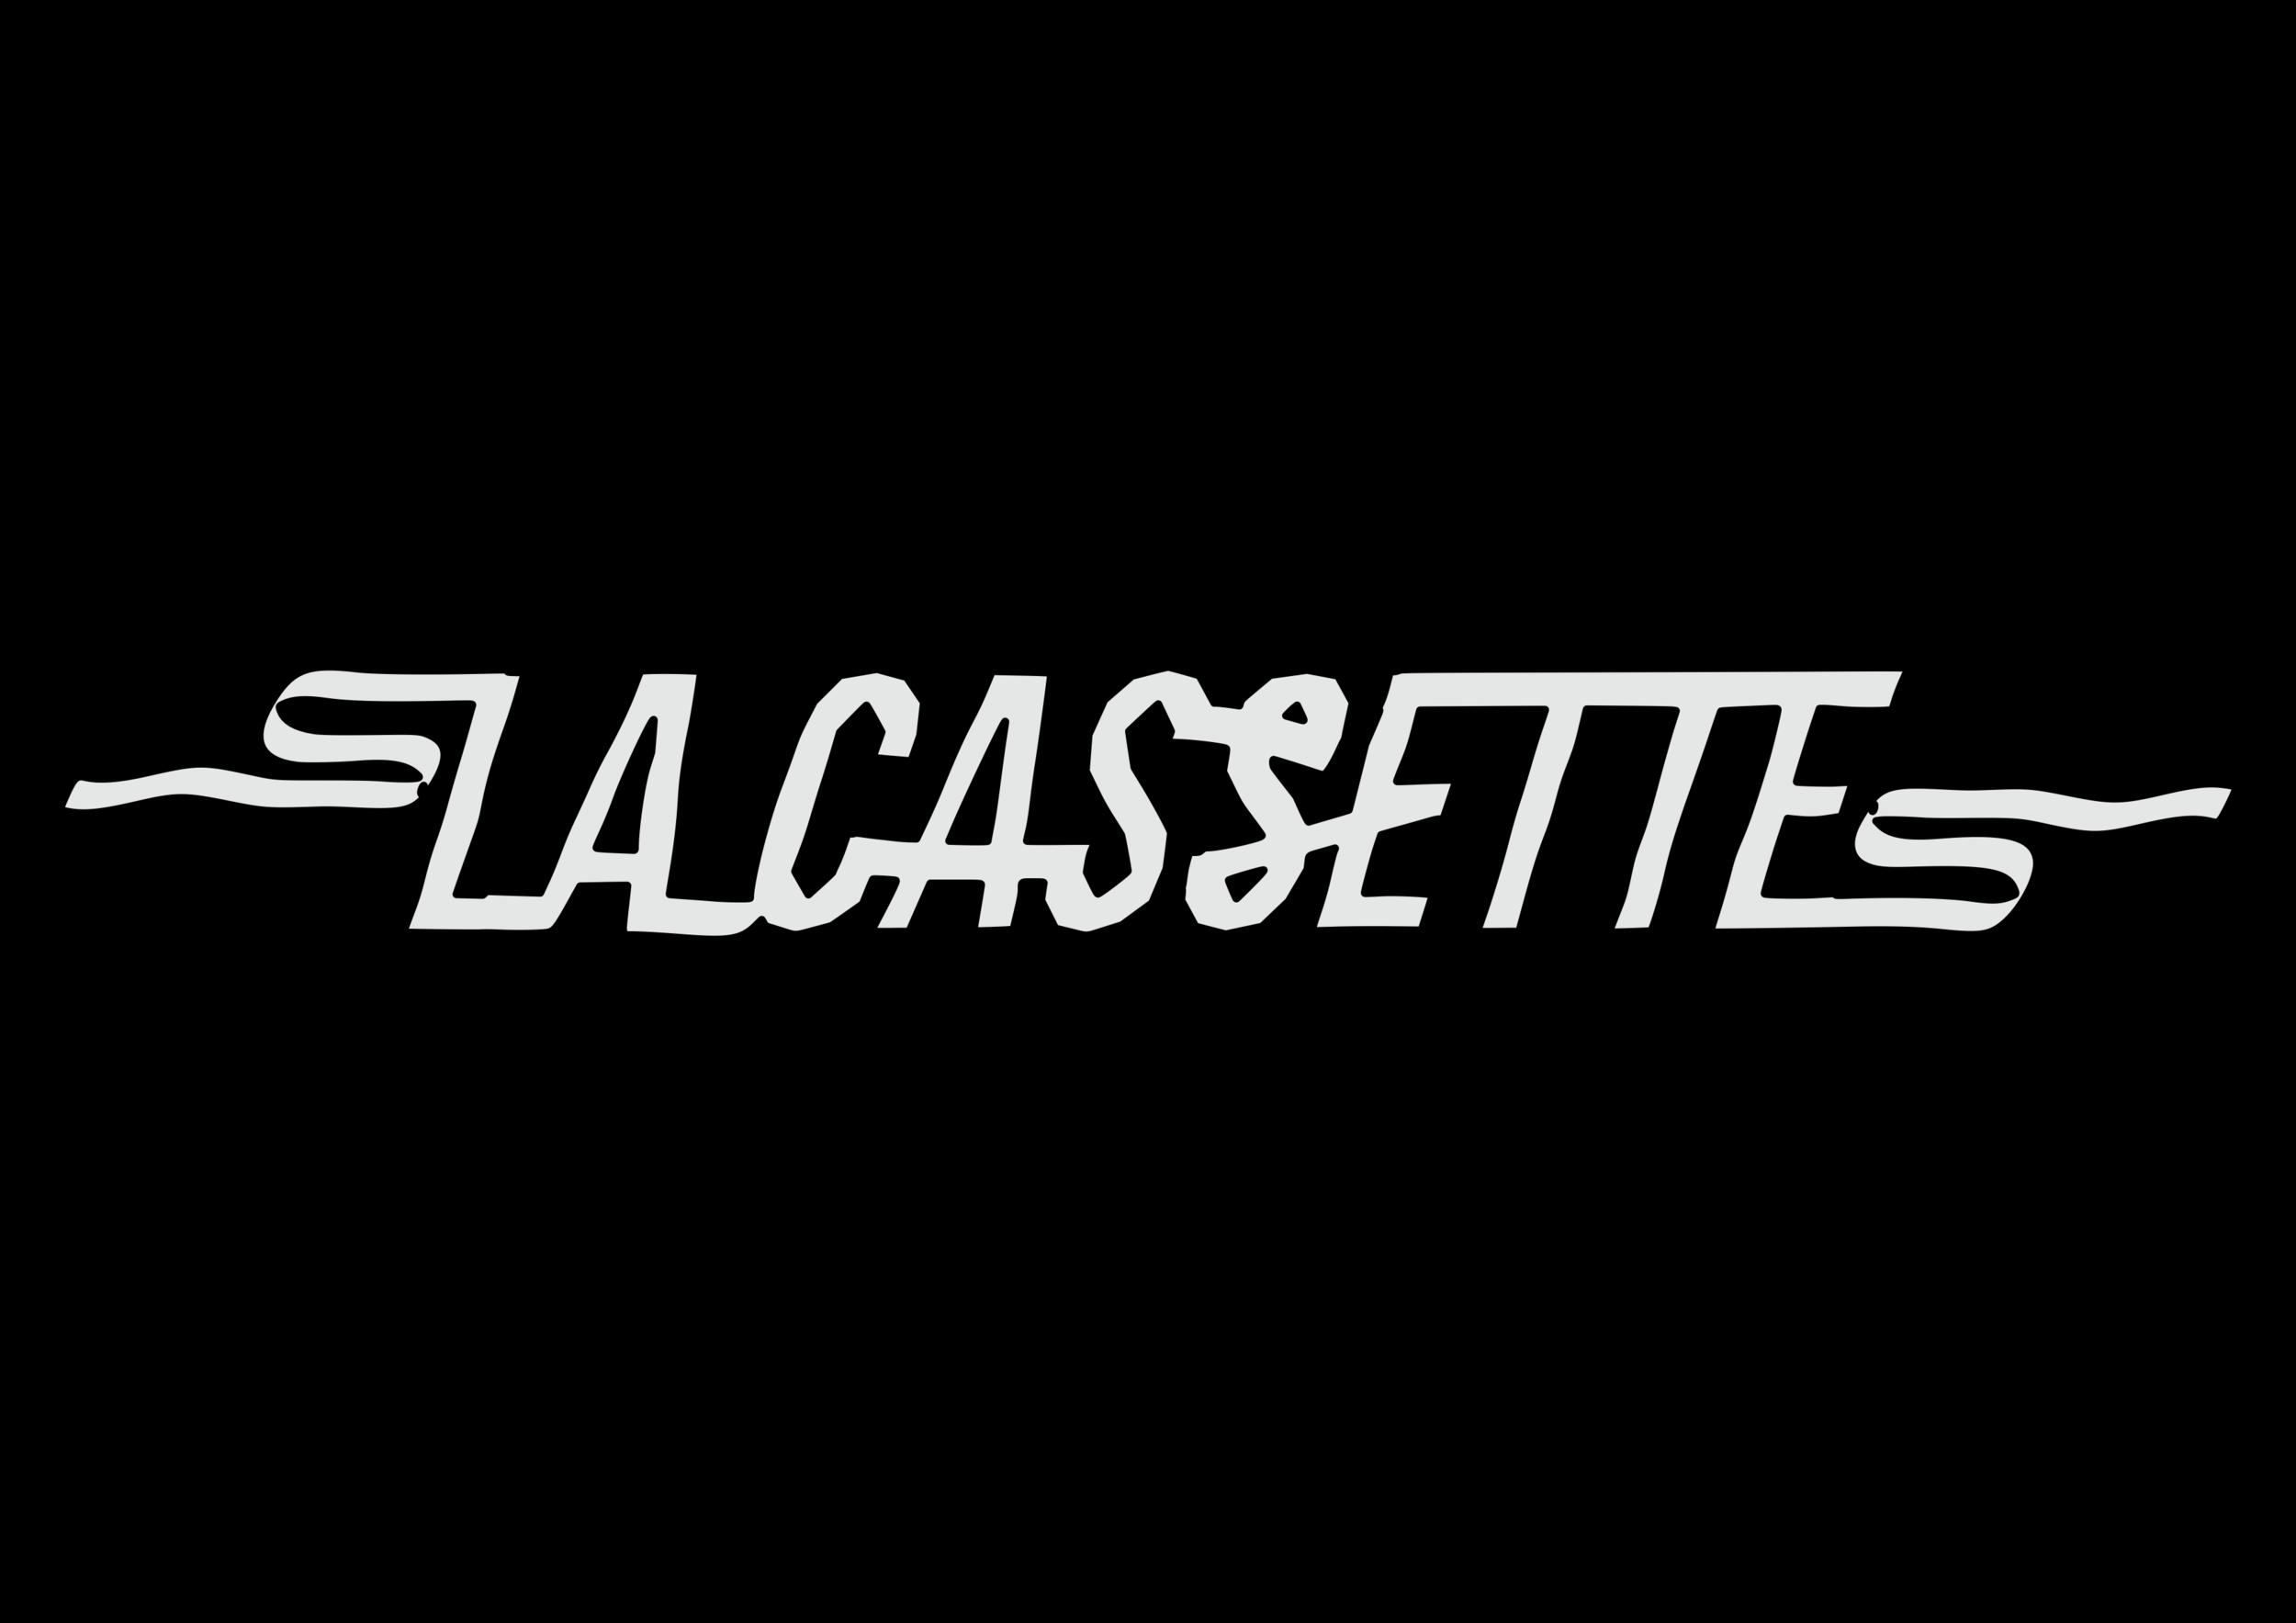 logoLaCassette.png